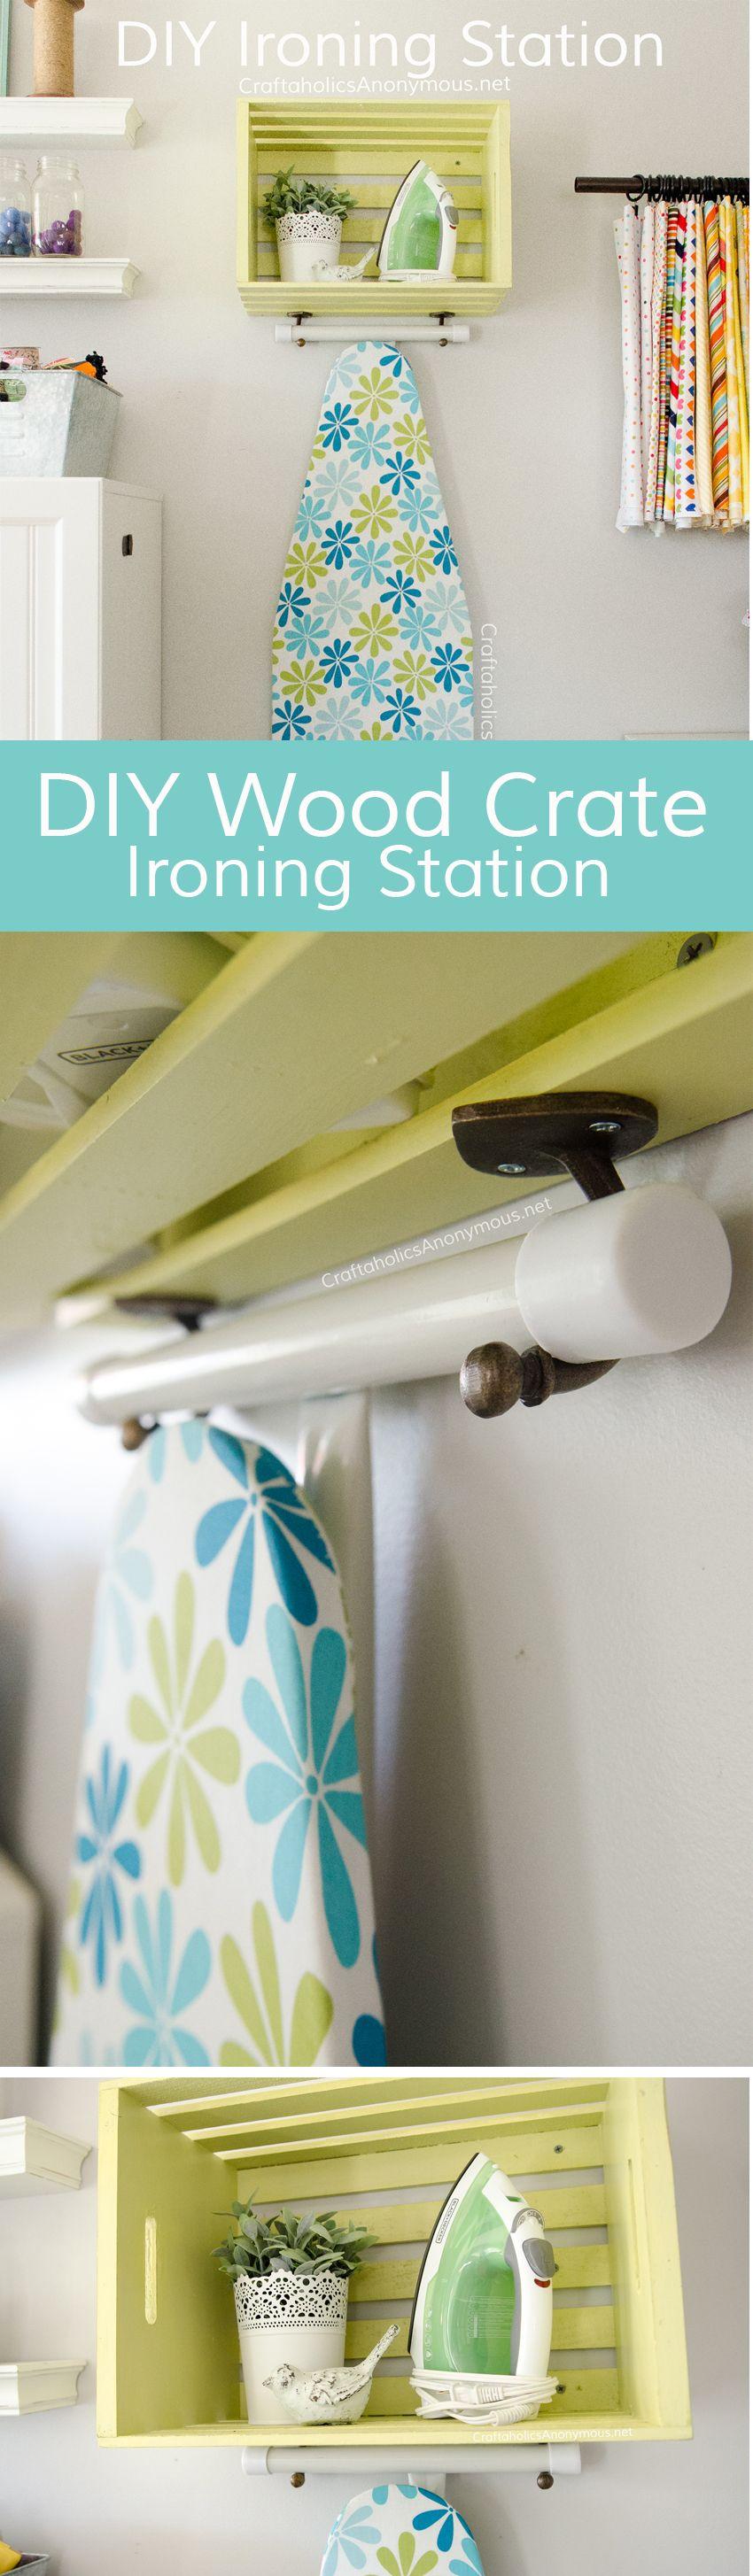 Diy Ironing Station Behrbox Challenge Reveal Ironing